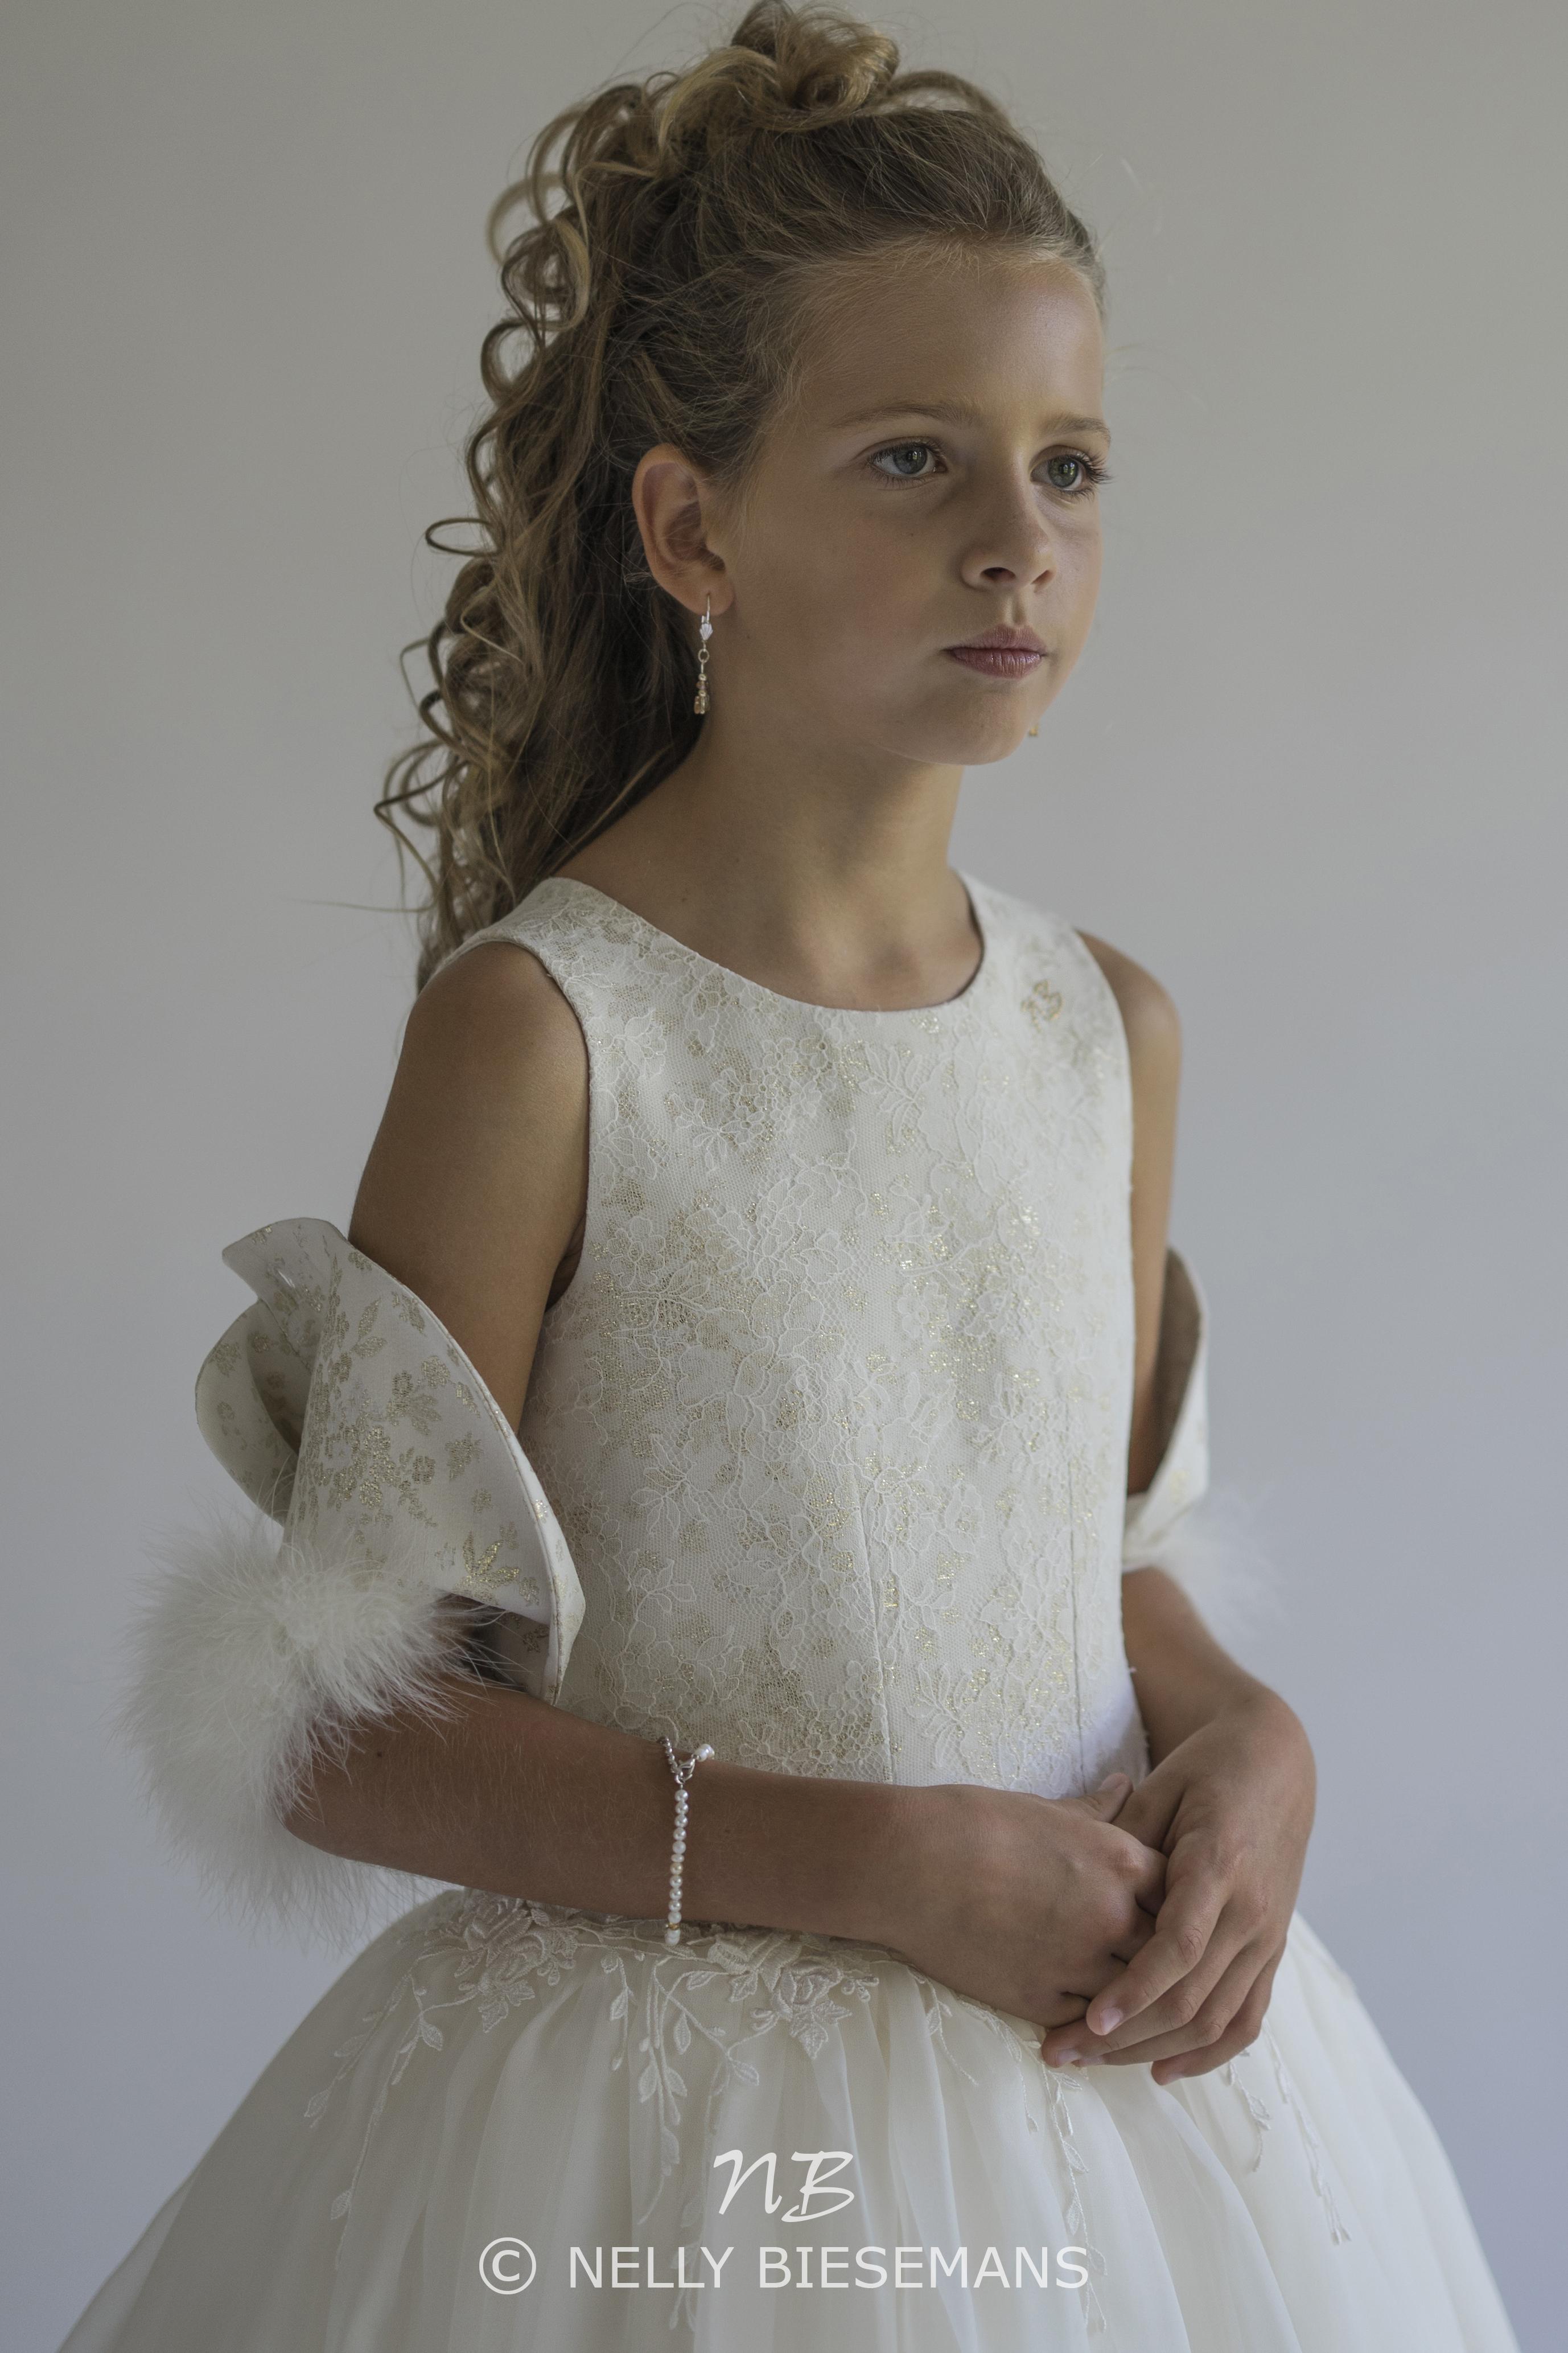 exclusieve communiejurk – bruidsmeisje – vormsel – Nelly Biesemans – www.nb4kids.com – A19K22(2)